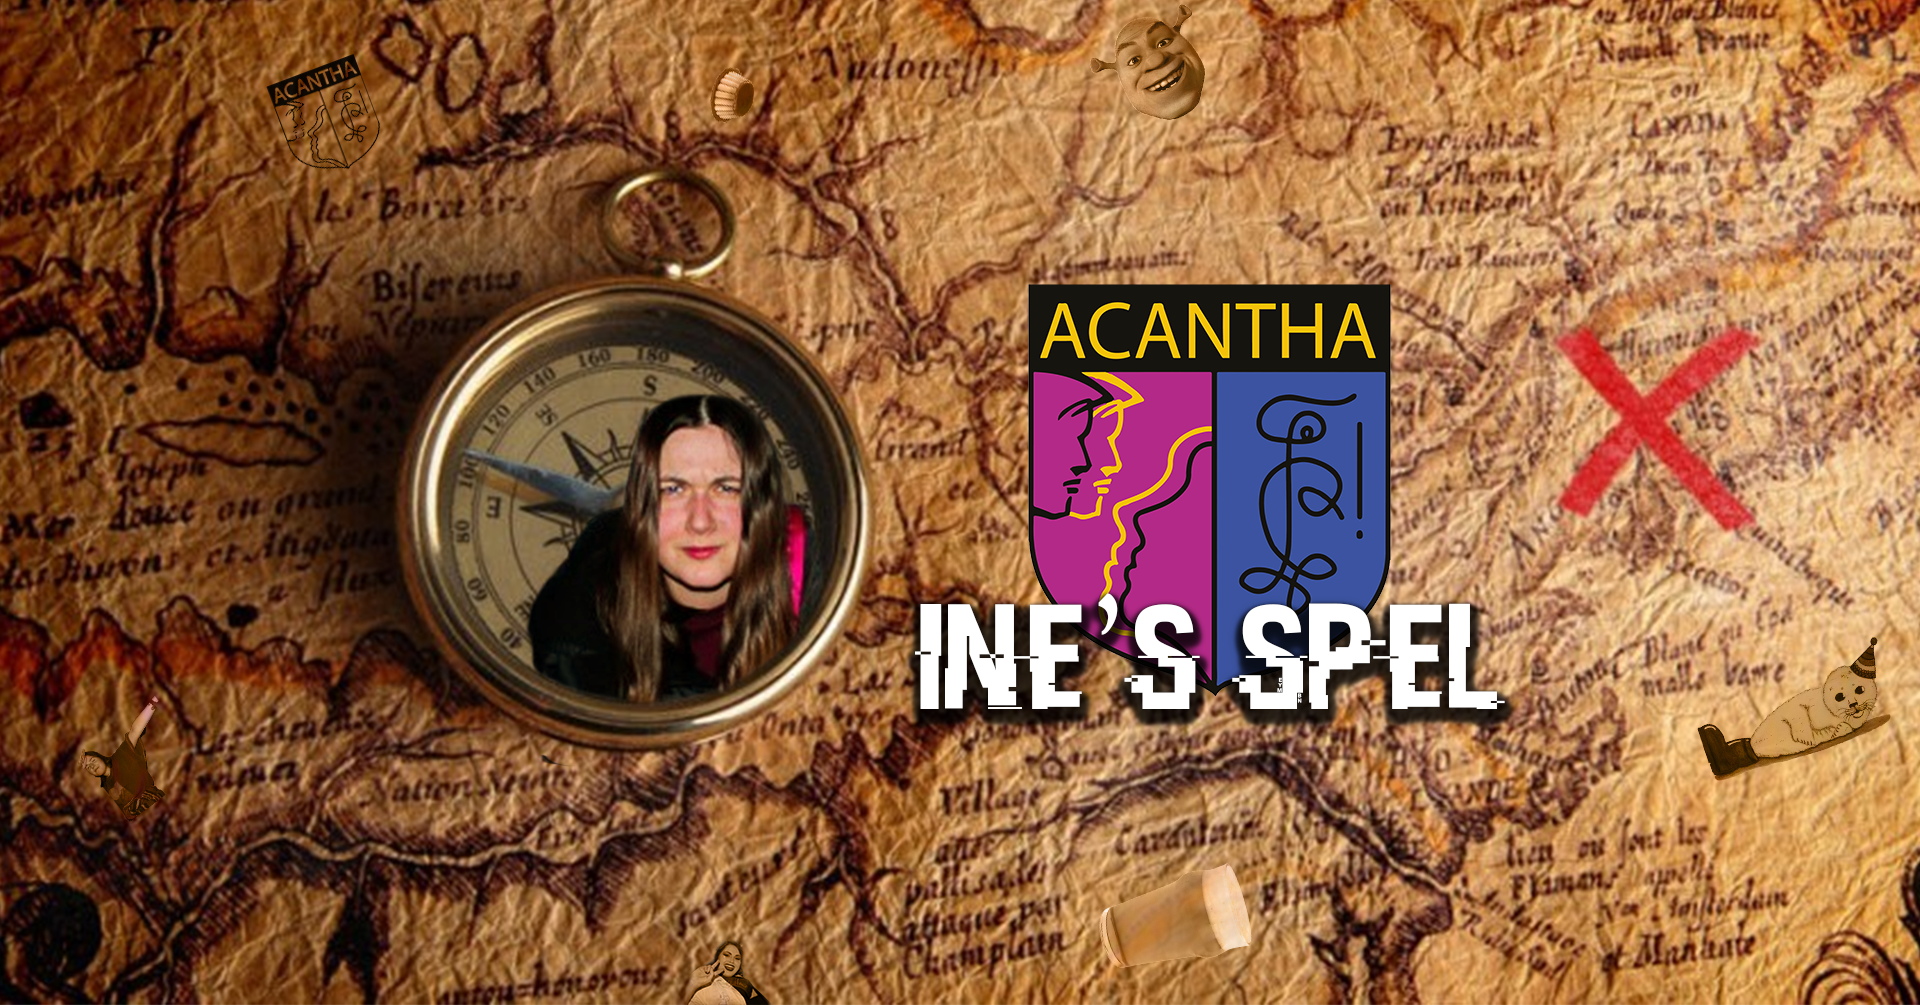 Acantha Ine's Spel Stadsspel Zoektocht